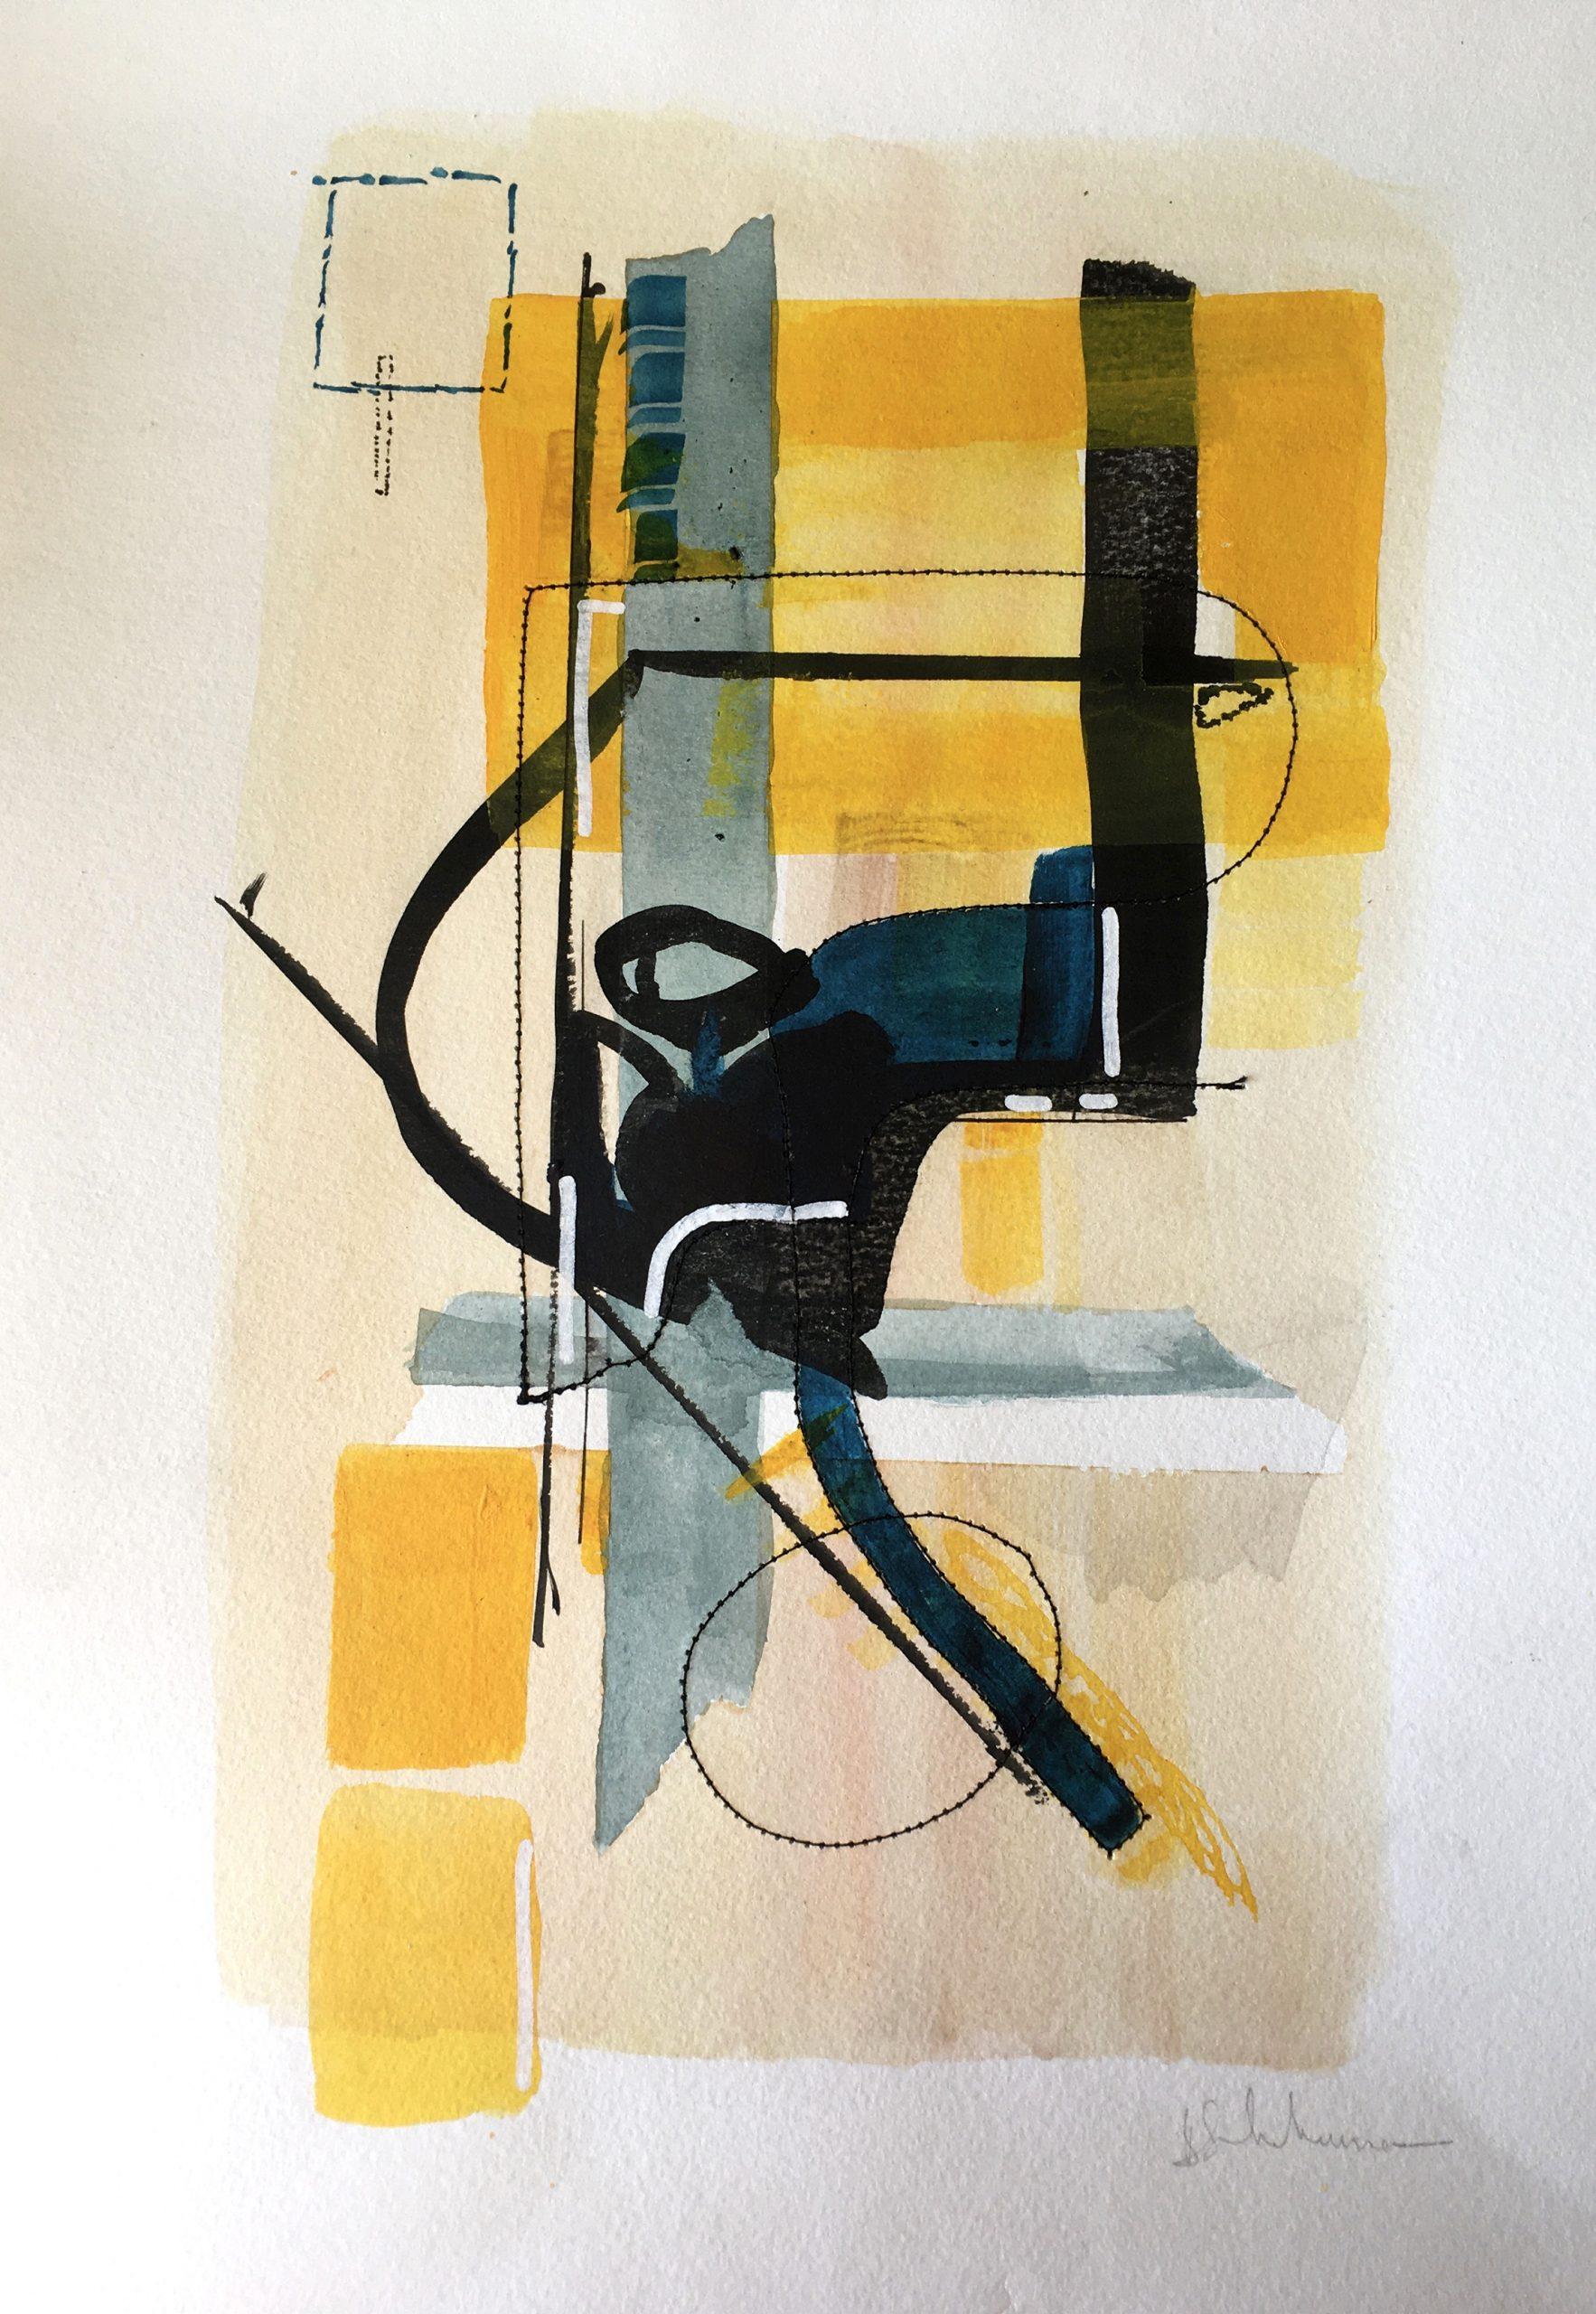 Florence Ichter-Simon